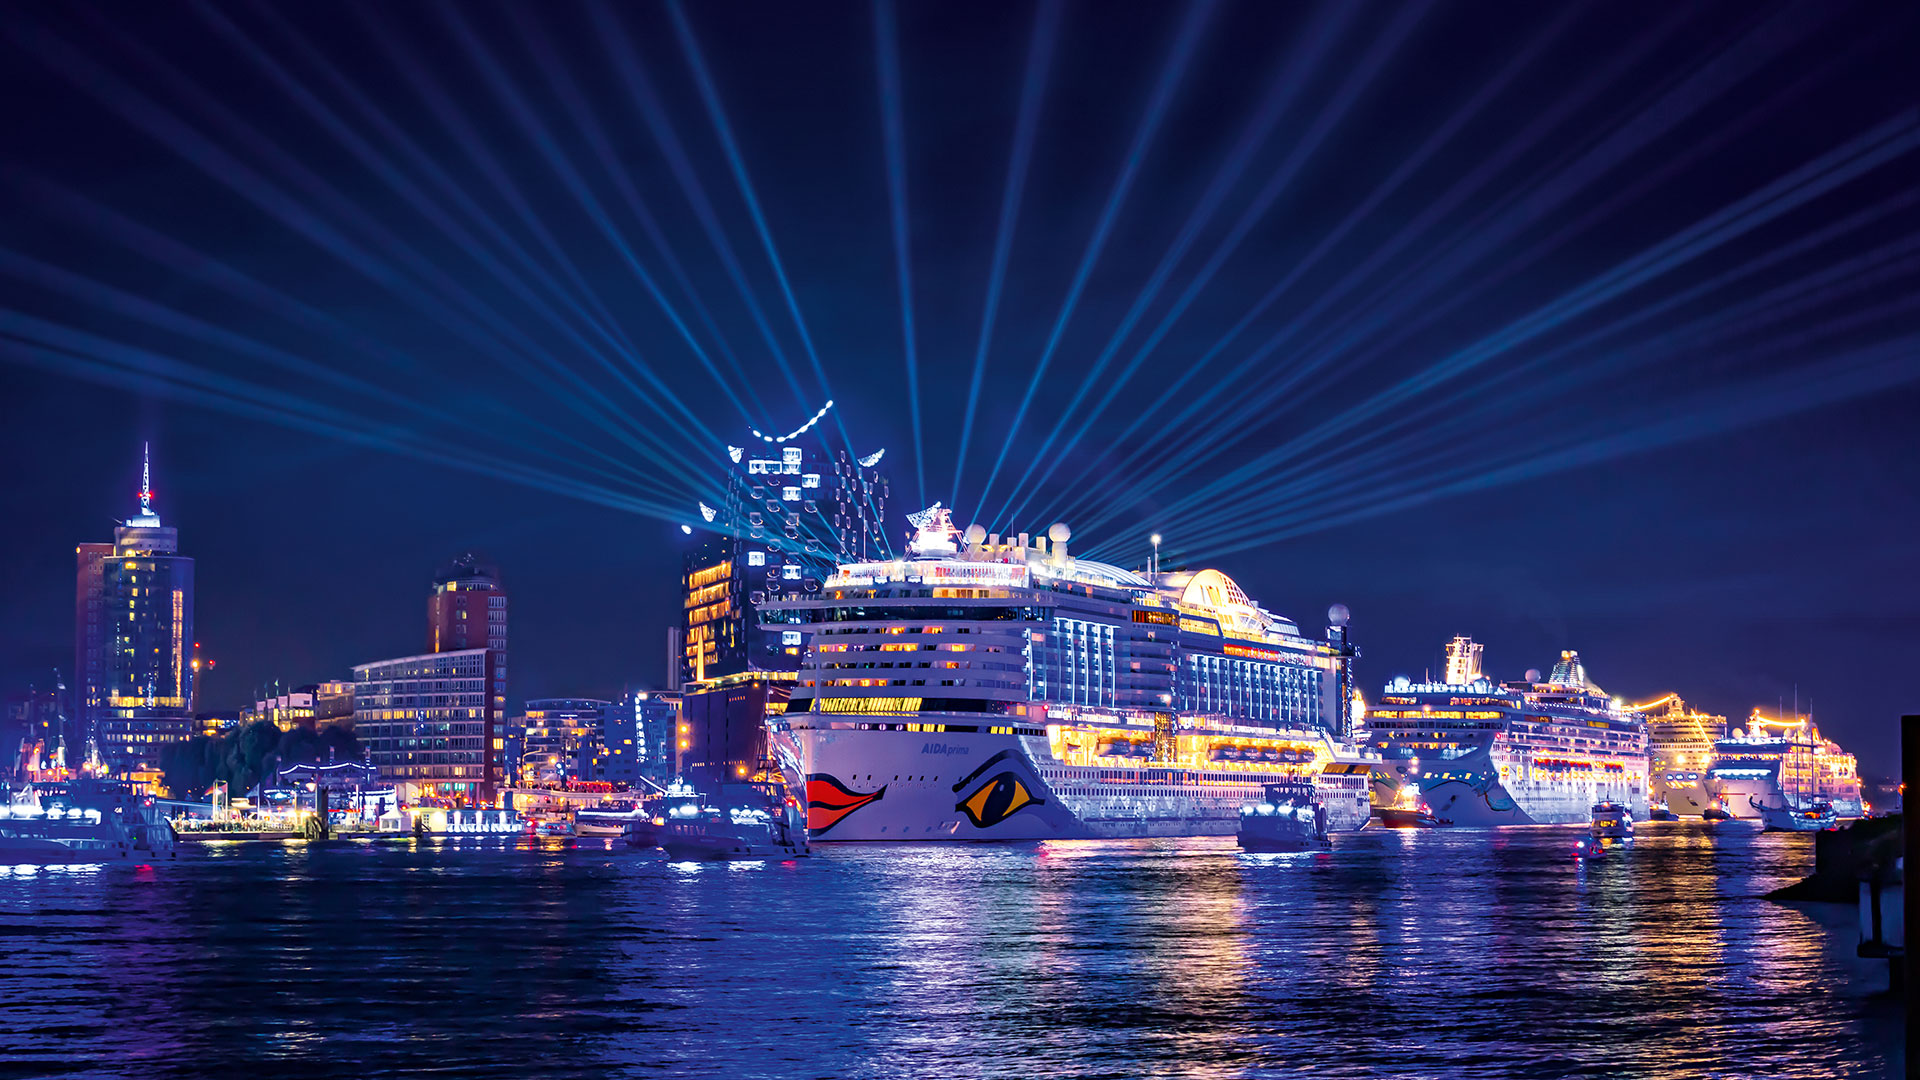 Hamburg Cruise Days © Hamburg Cruise Days/ CHL PhotoDesign Jan Schugardt